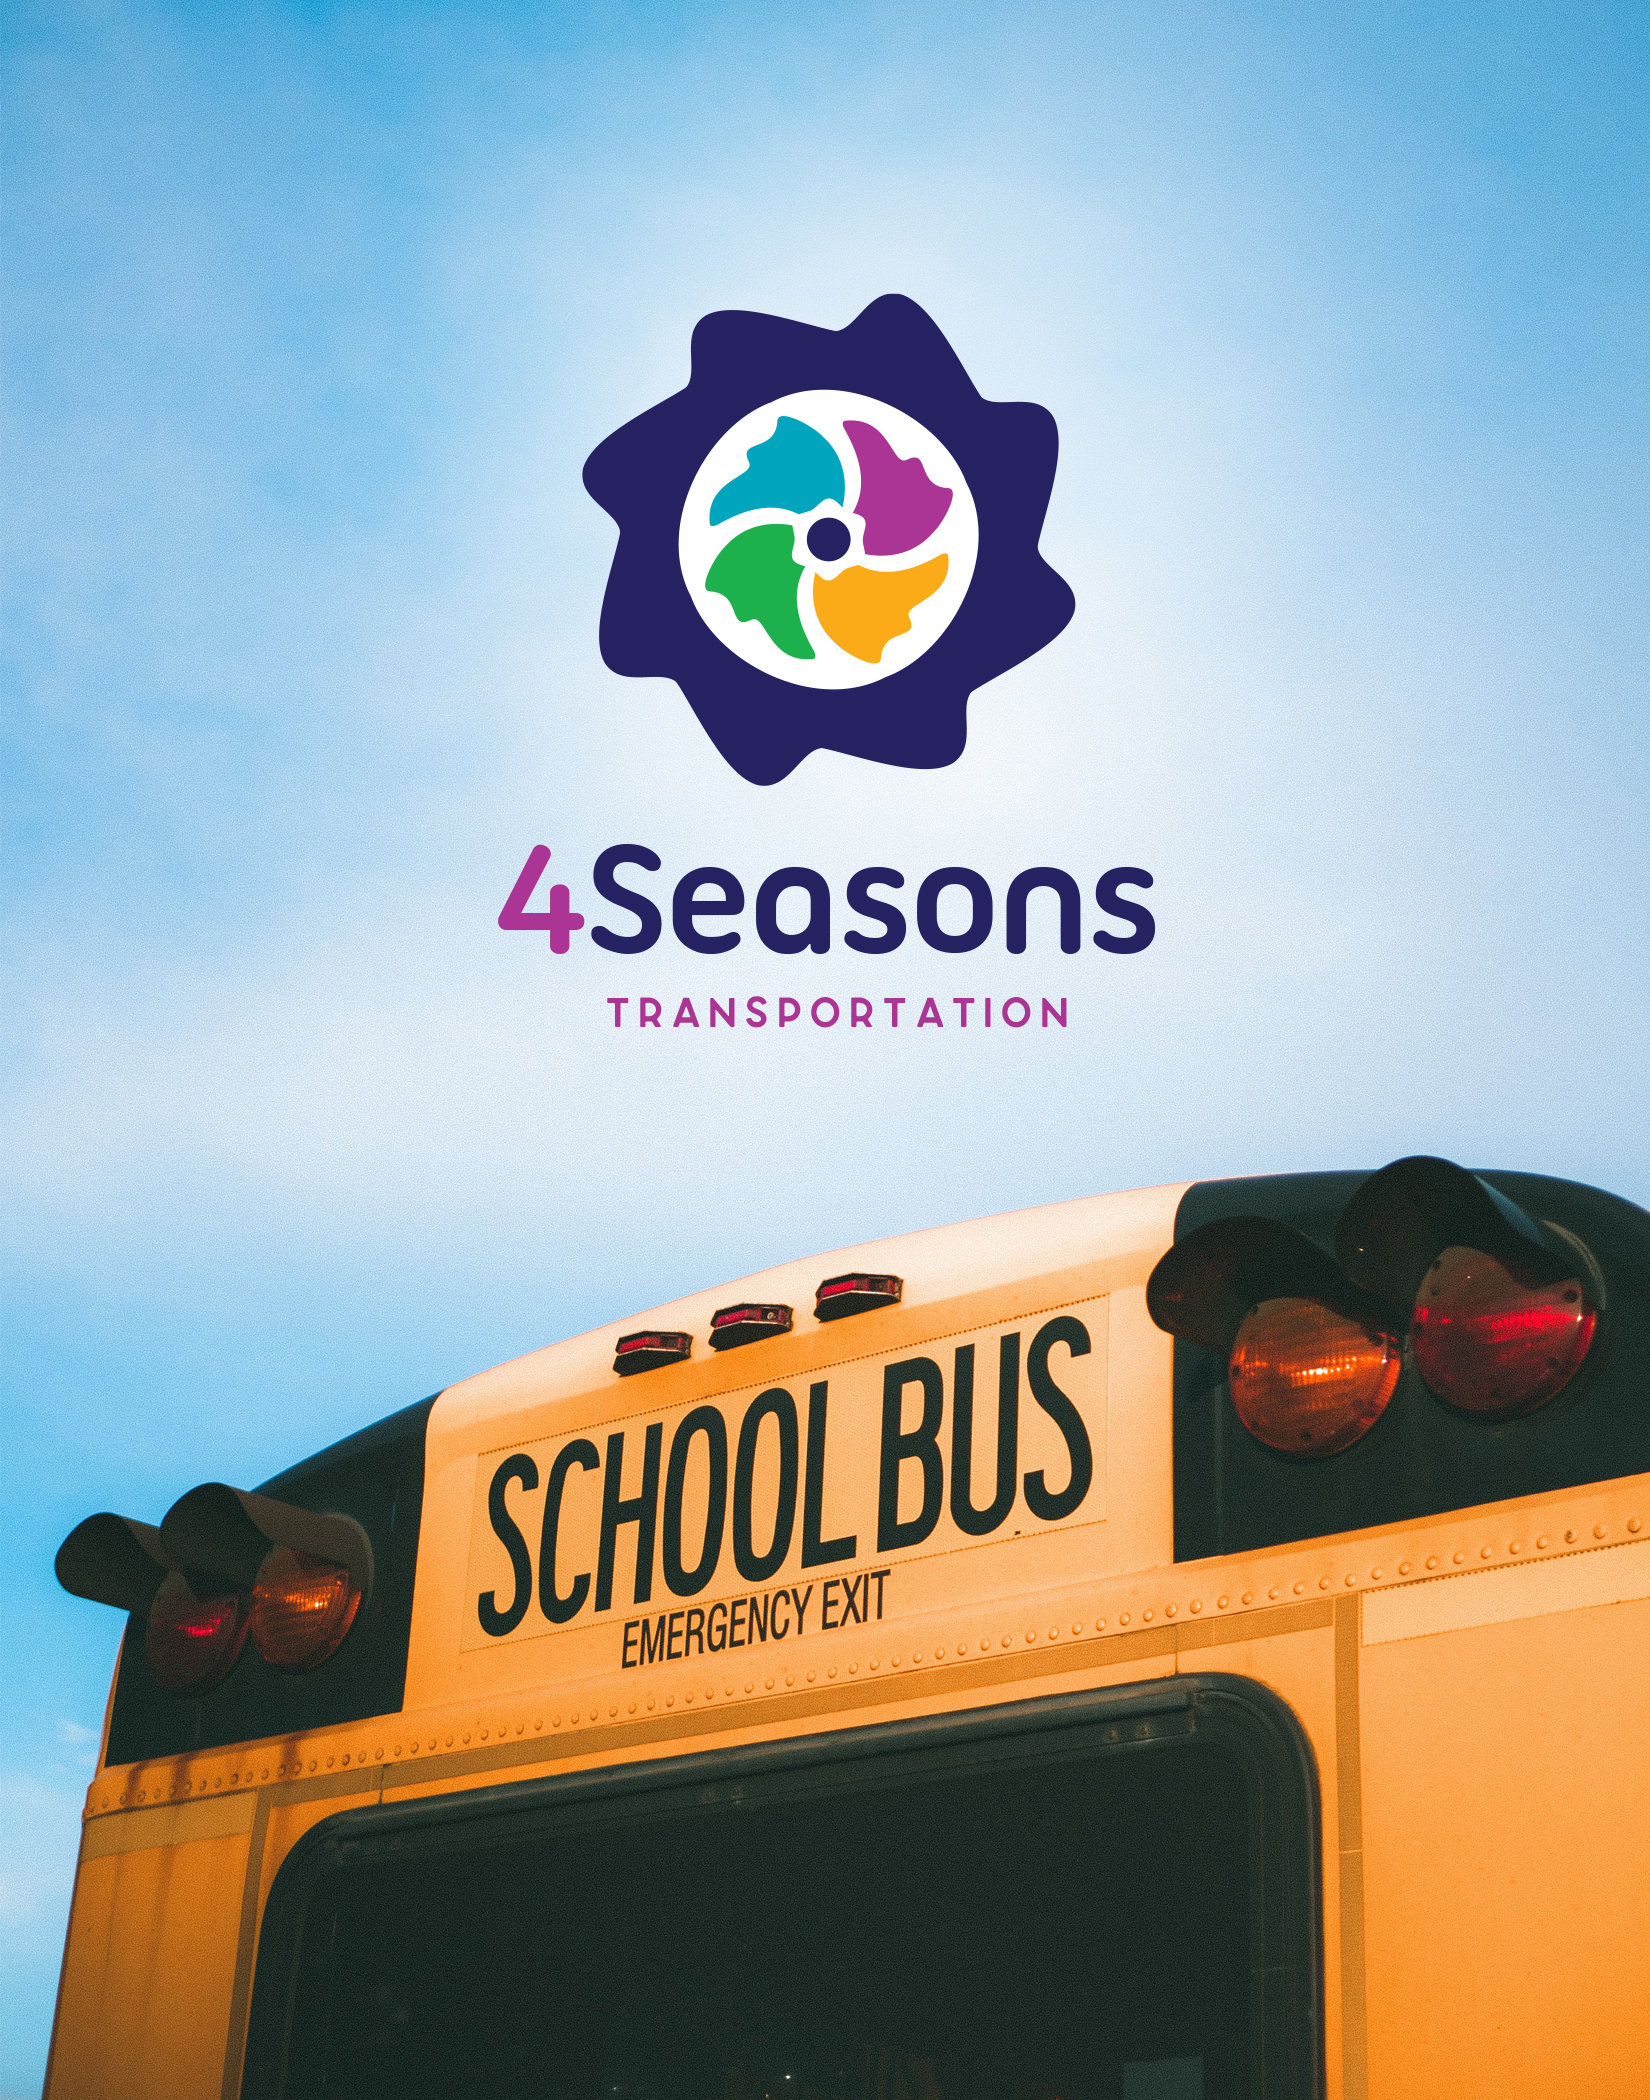 4seaons transportation logo design